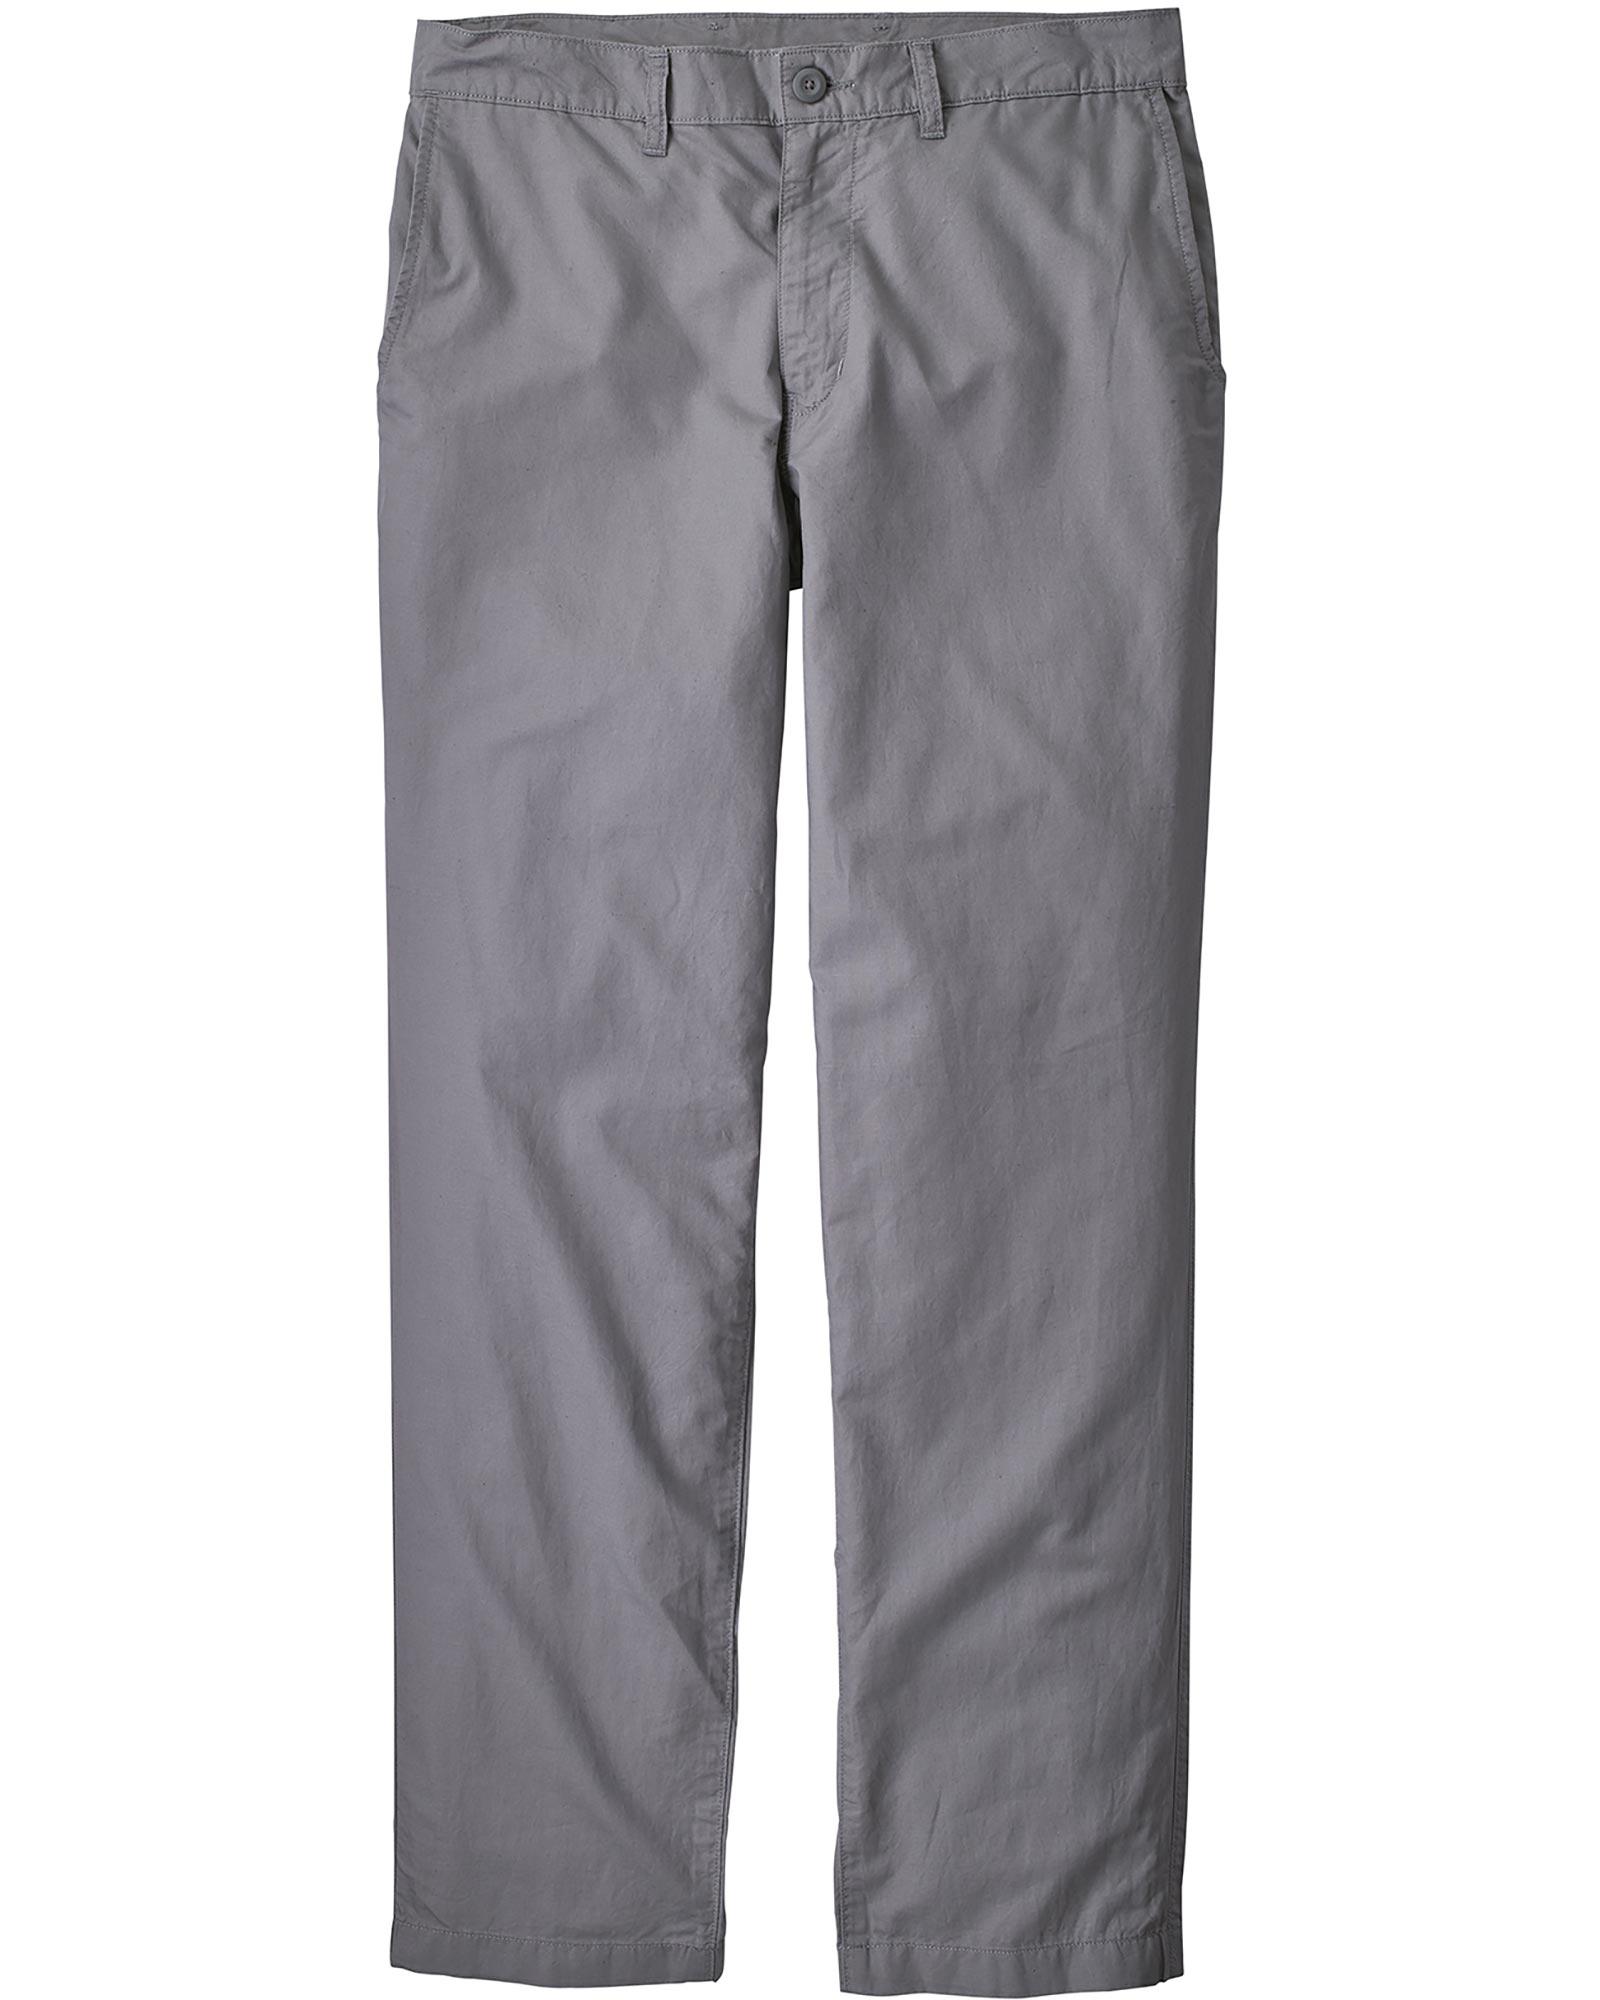 Patagonia Men's All Wear Hemp Pants 0